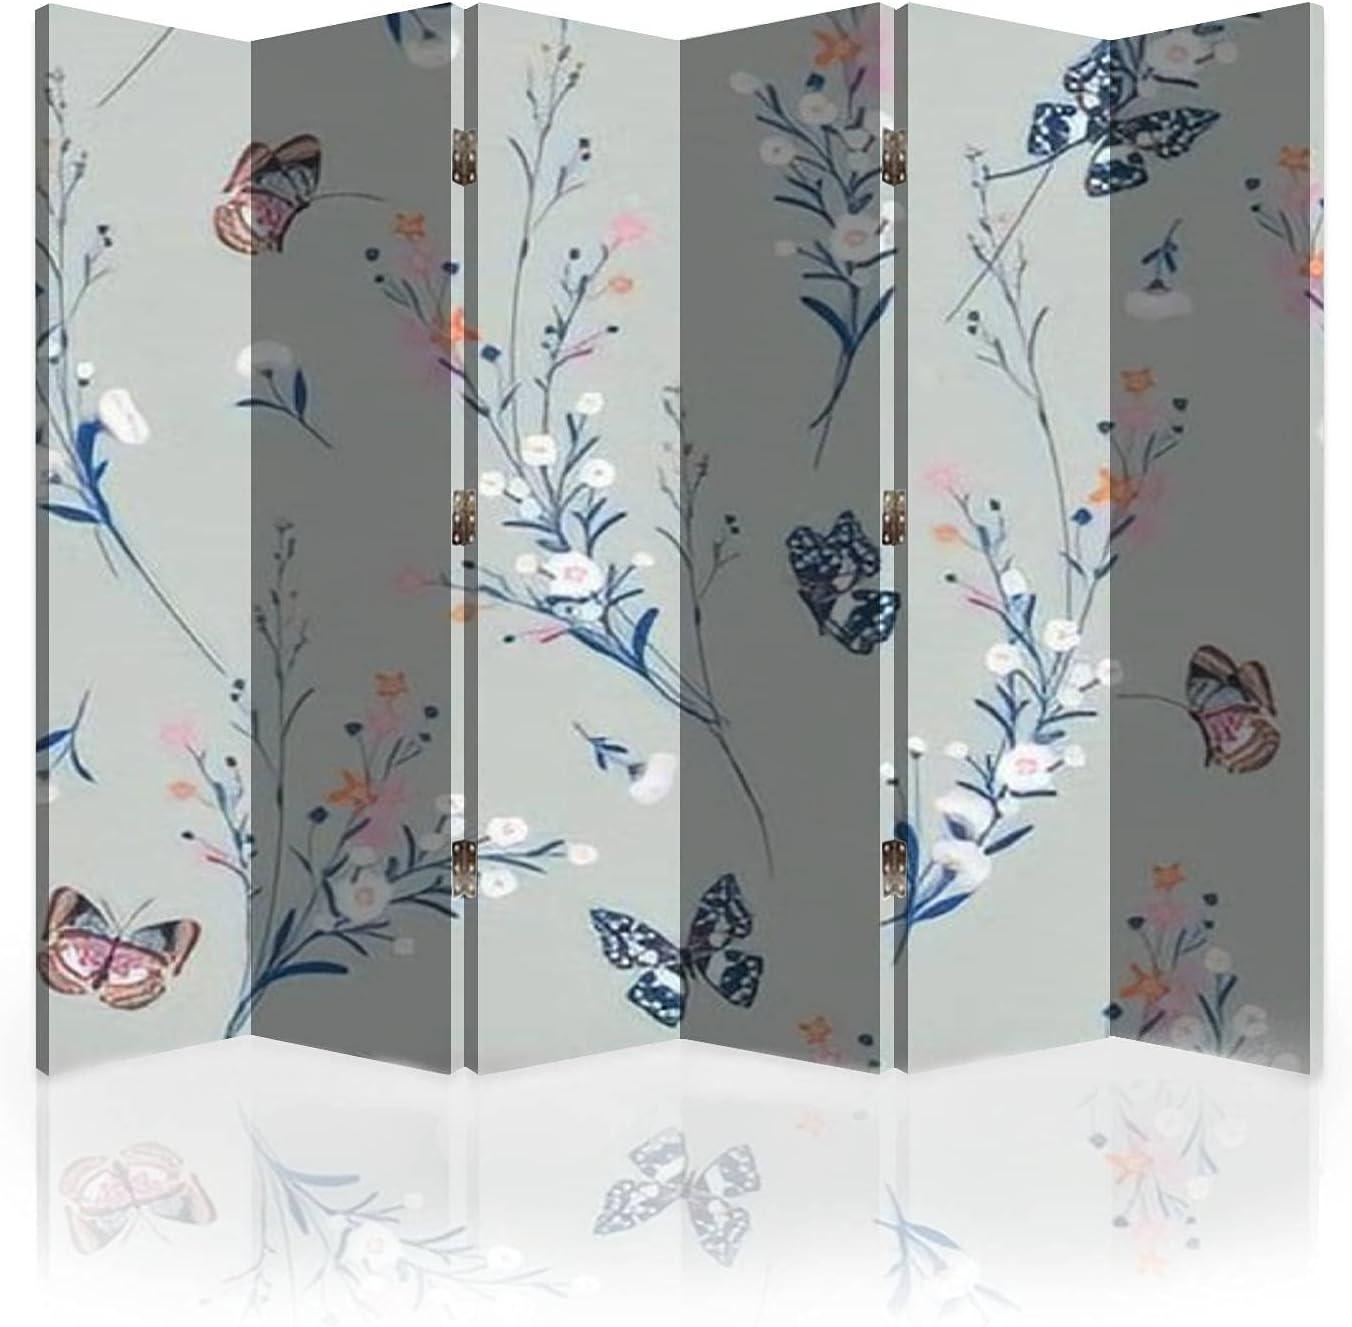 Canvas Room Divider Screen Sweet Blowing Flowers Japan Sale item Maker New Pastel i Meadow